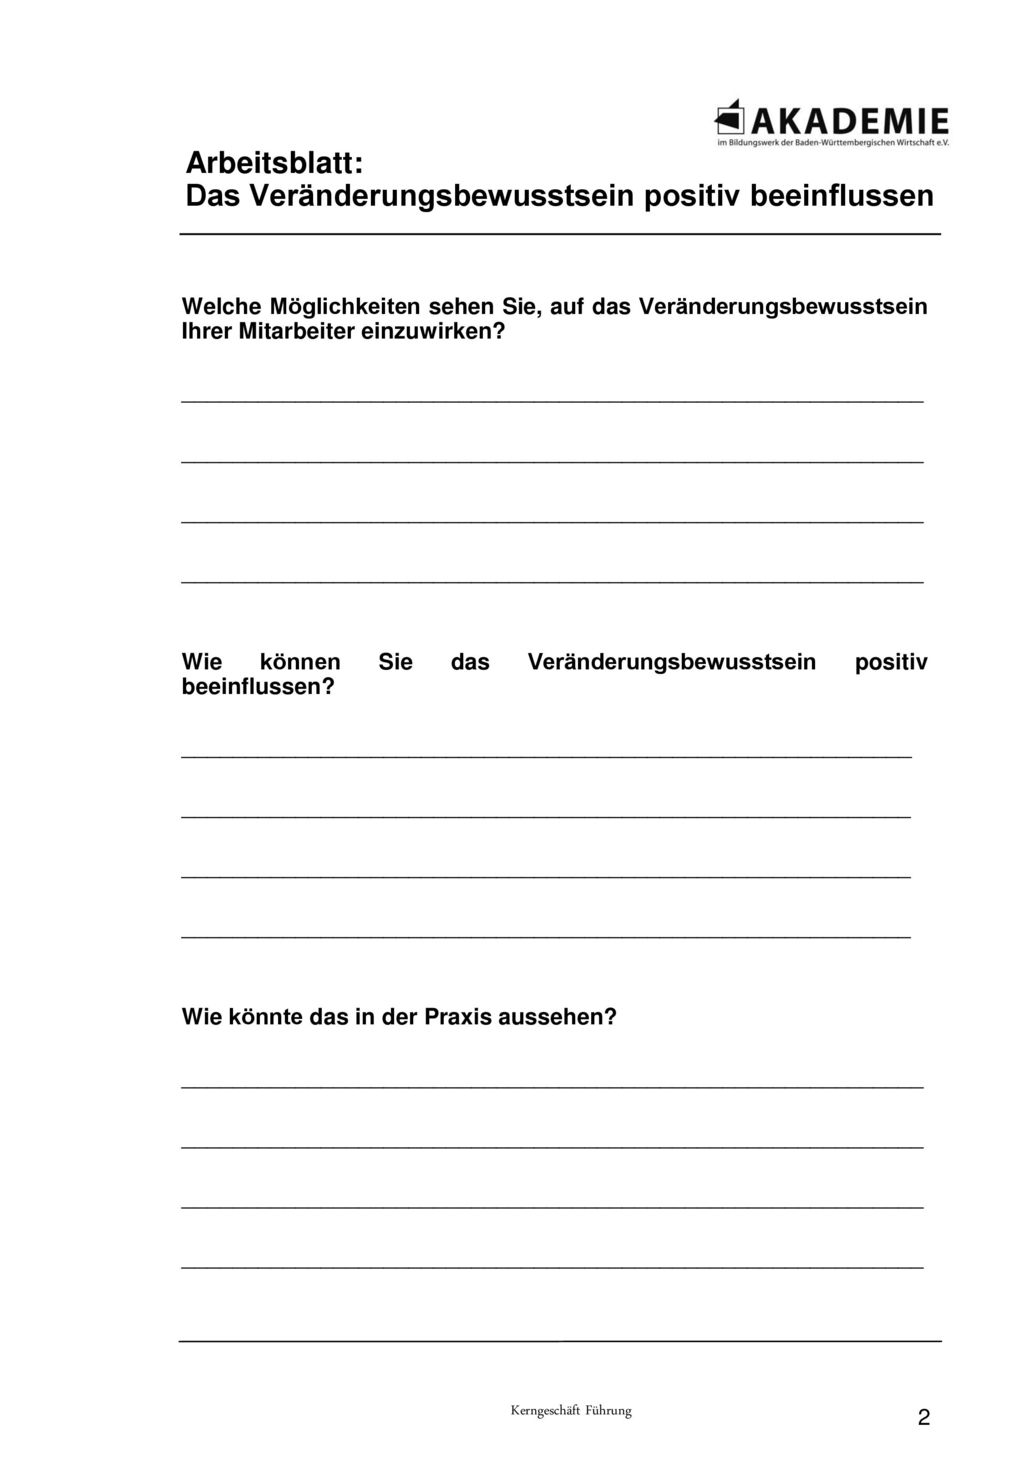 Luxury Alien Begegnungen Arbeitsblatt Inspiration - Kindergarten ...